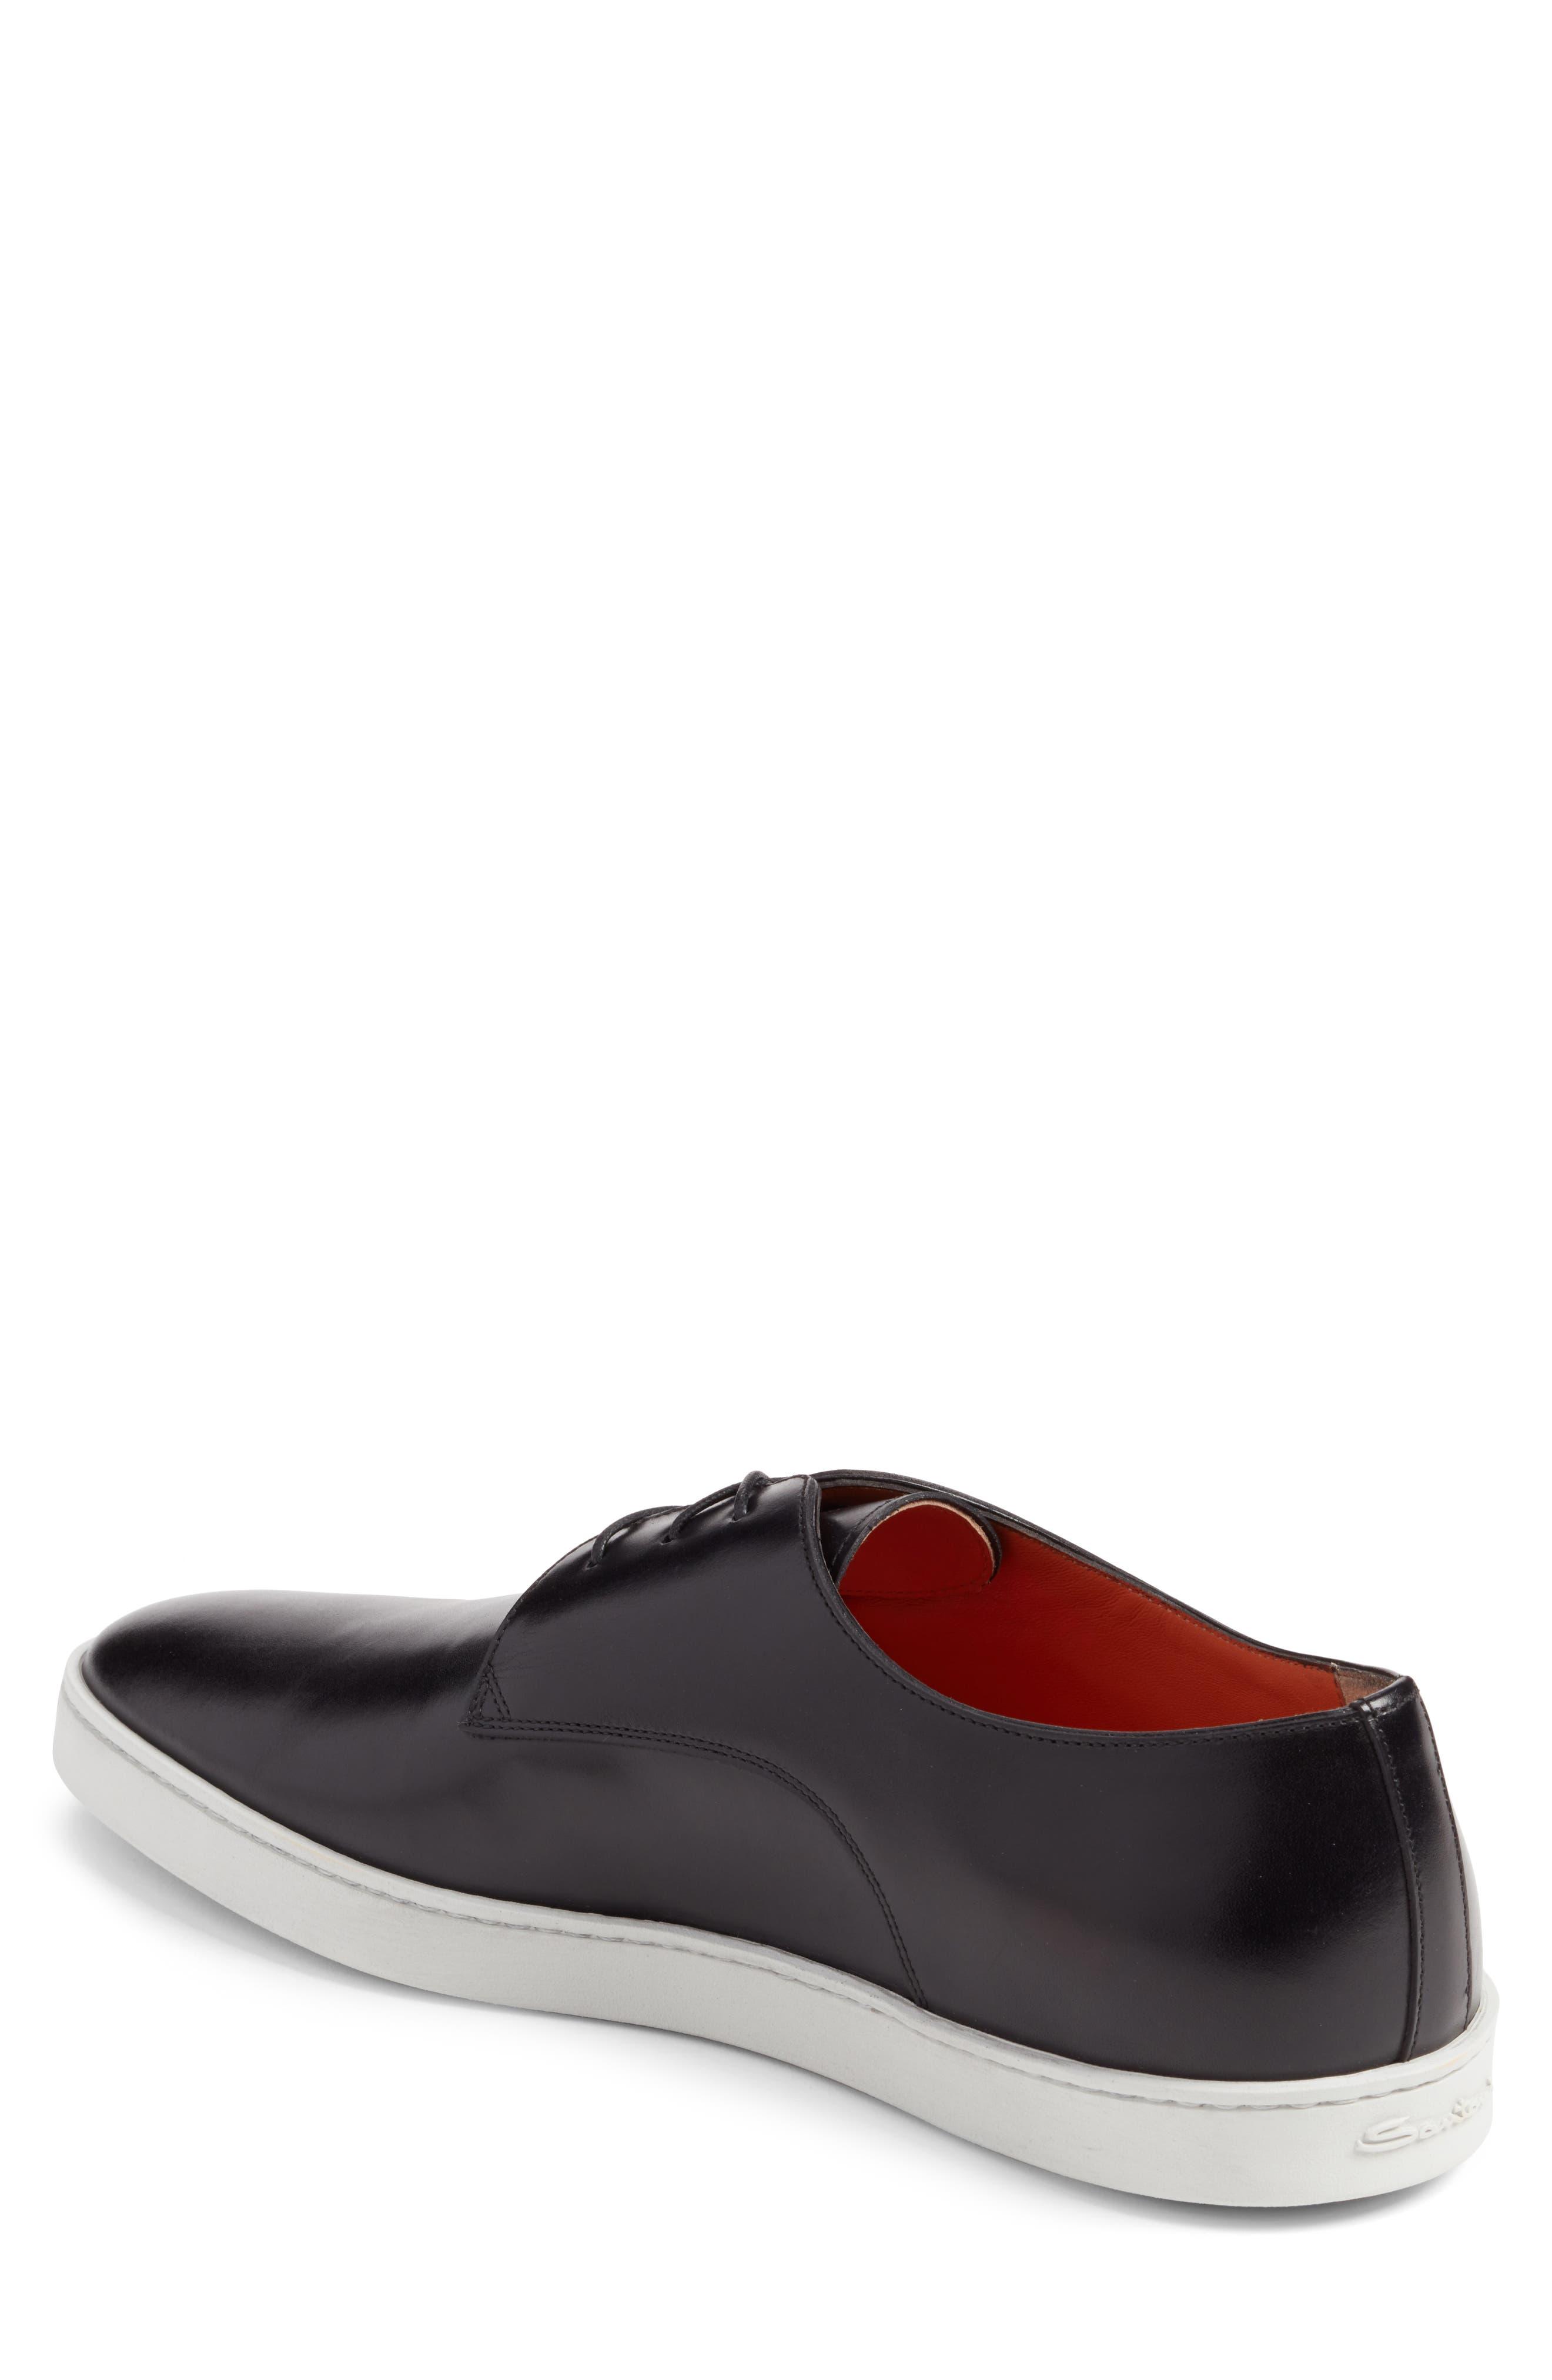 Doyle Sneaker,                             Alternate thumbnail 2, color,                             BLACK LEATHER